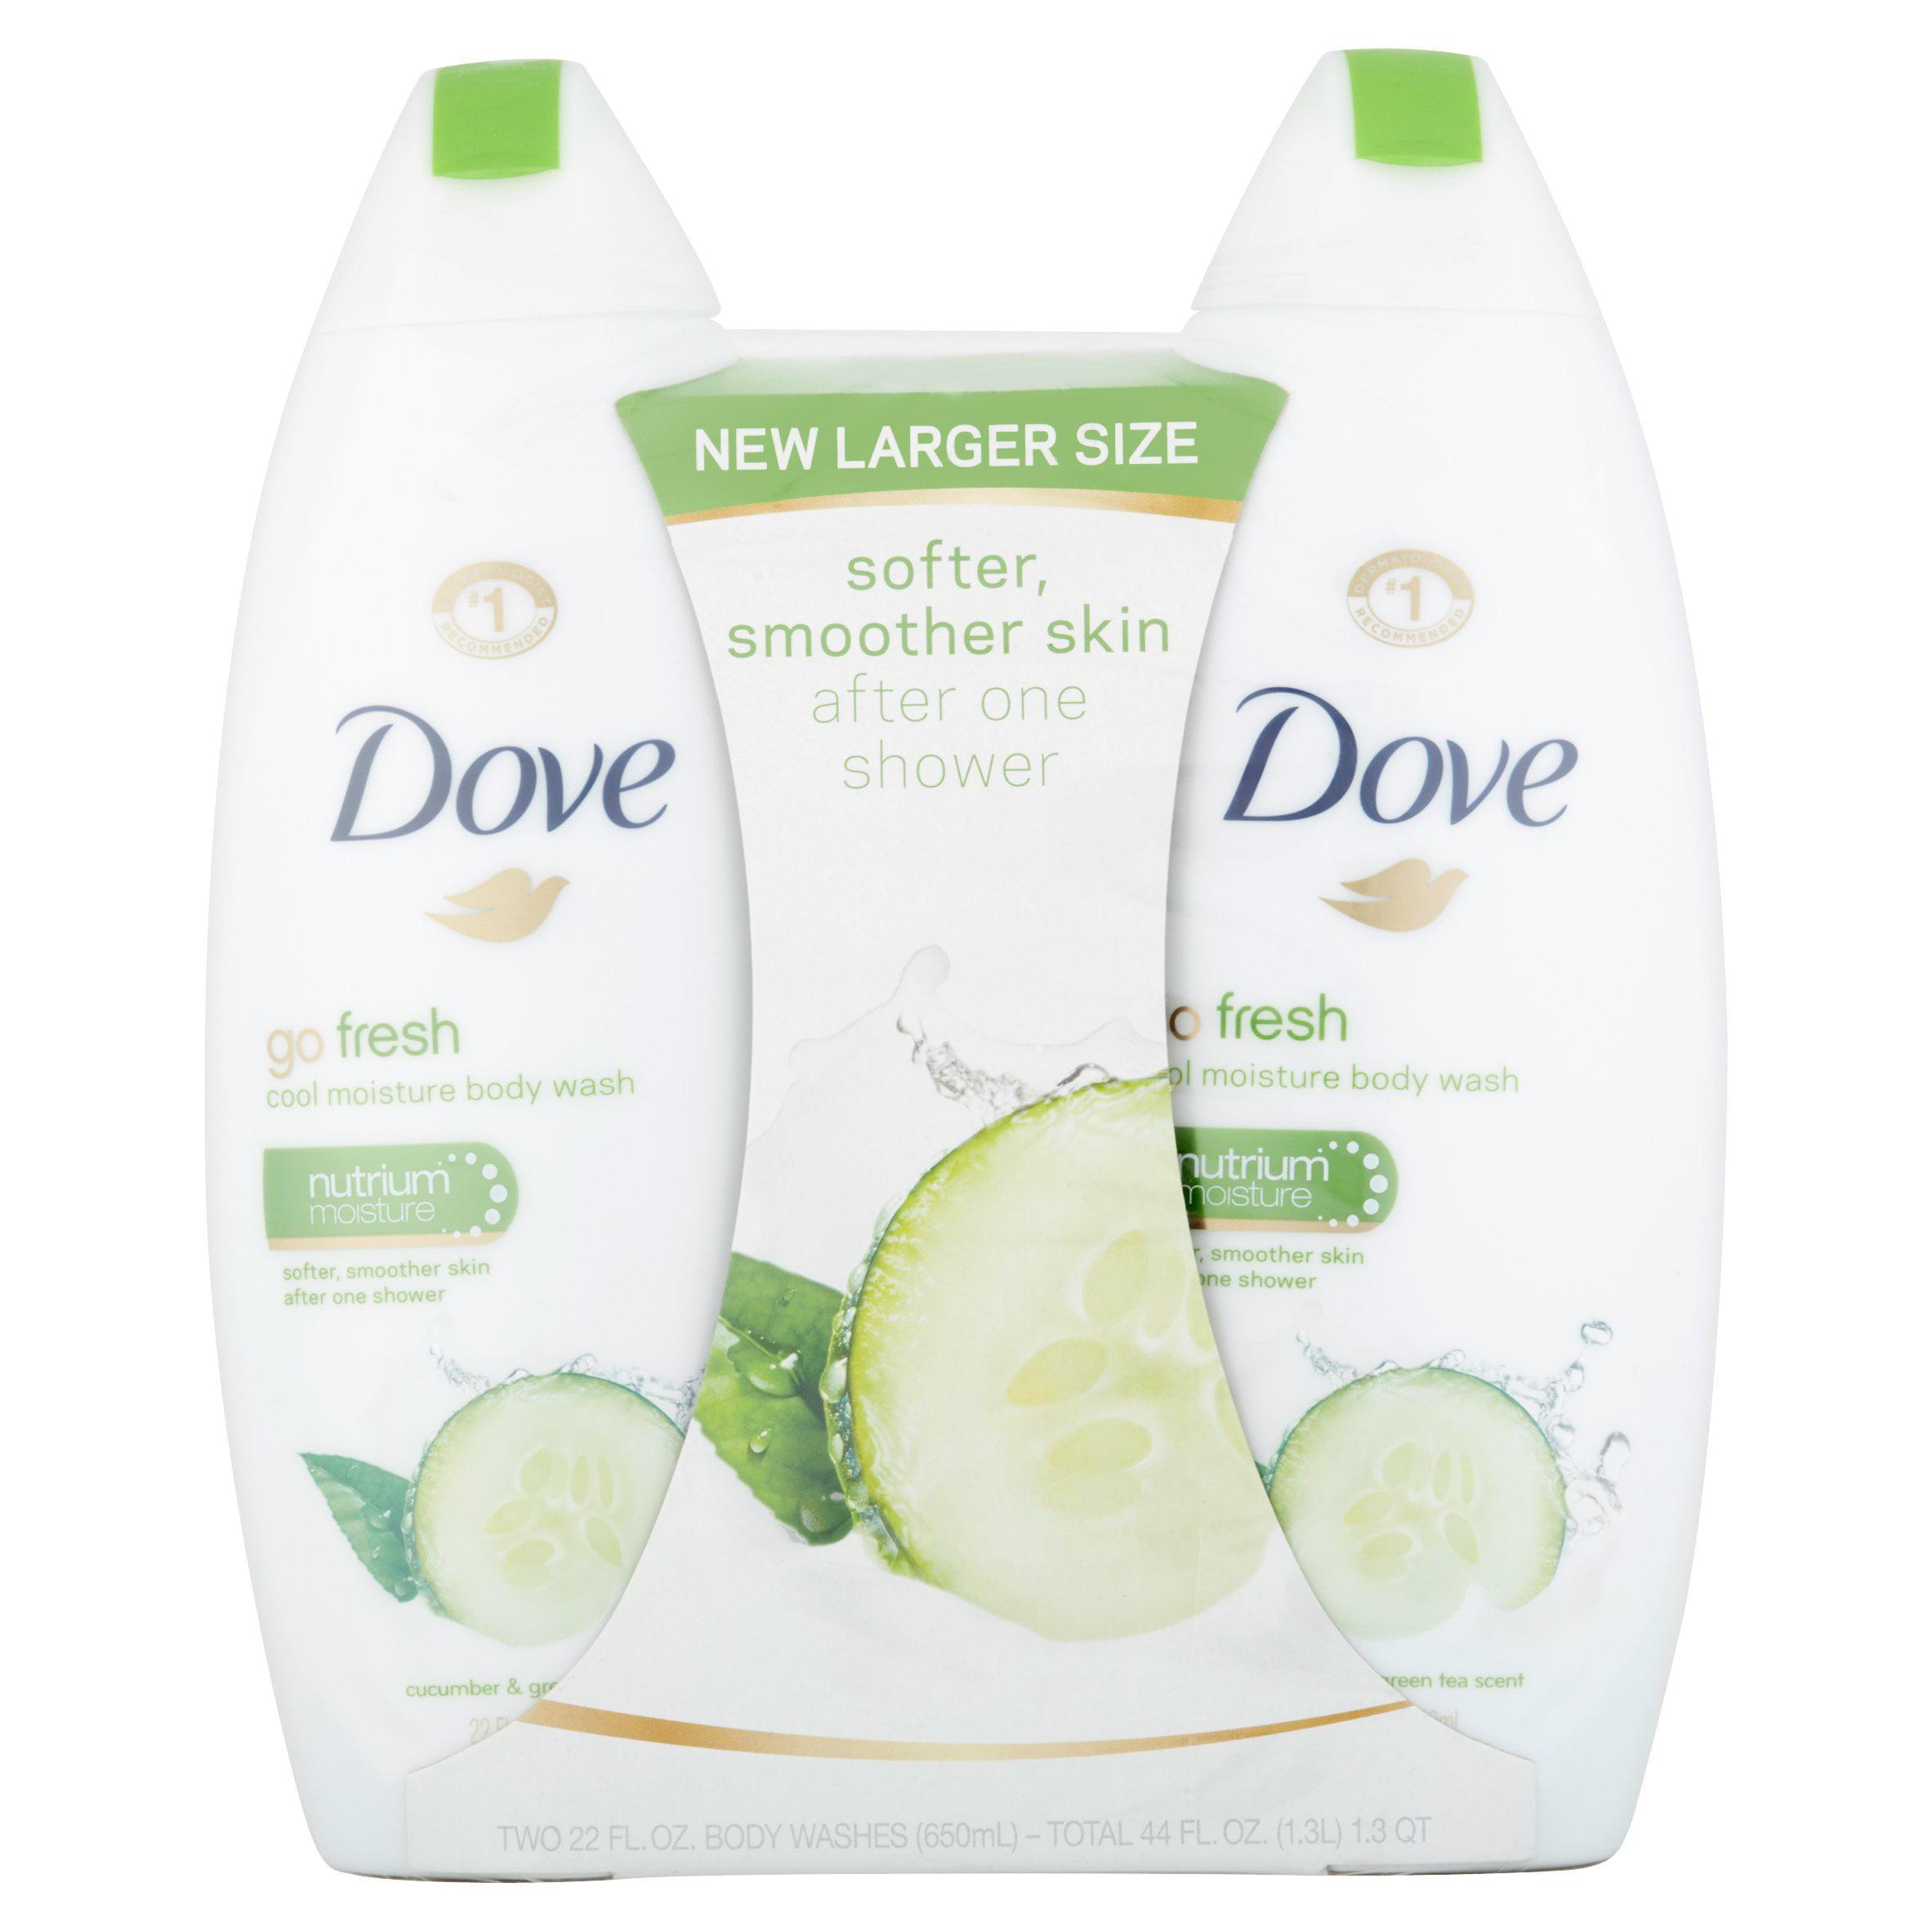 Dove go fresh Cucumber and Green Tea Body Wash, 22 oz, Twin Pack